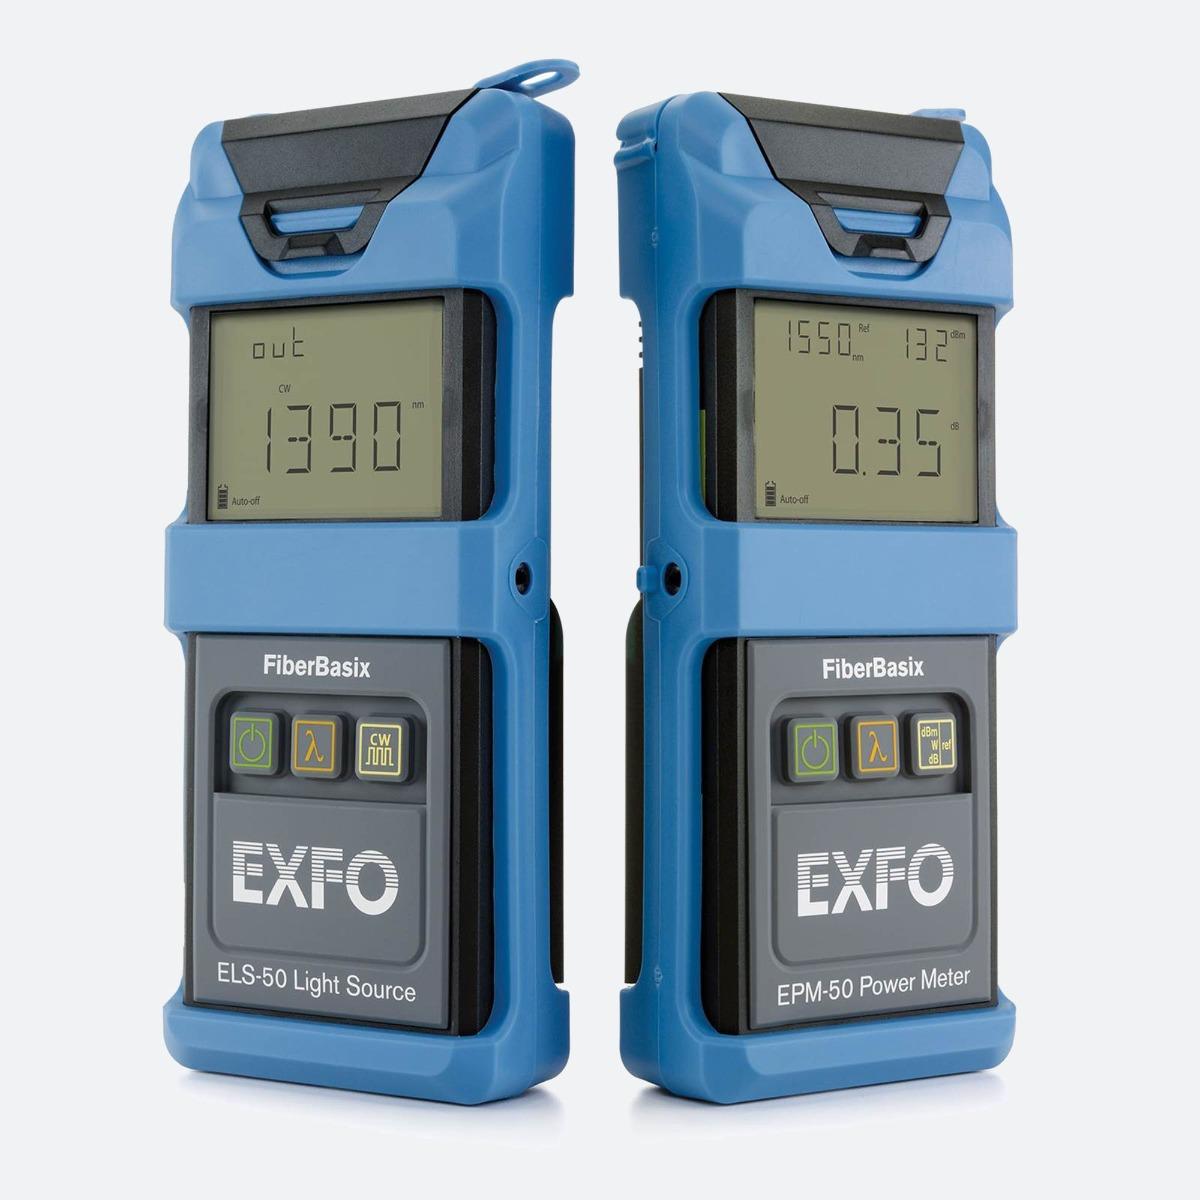 EXFO EPM-50 Power Meter